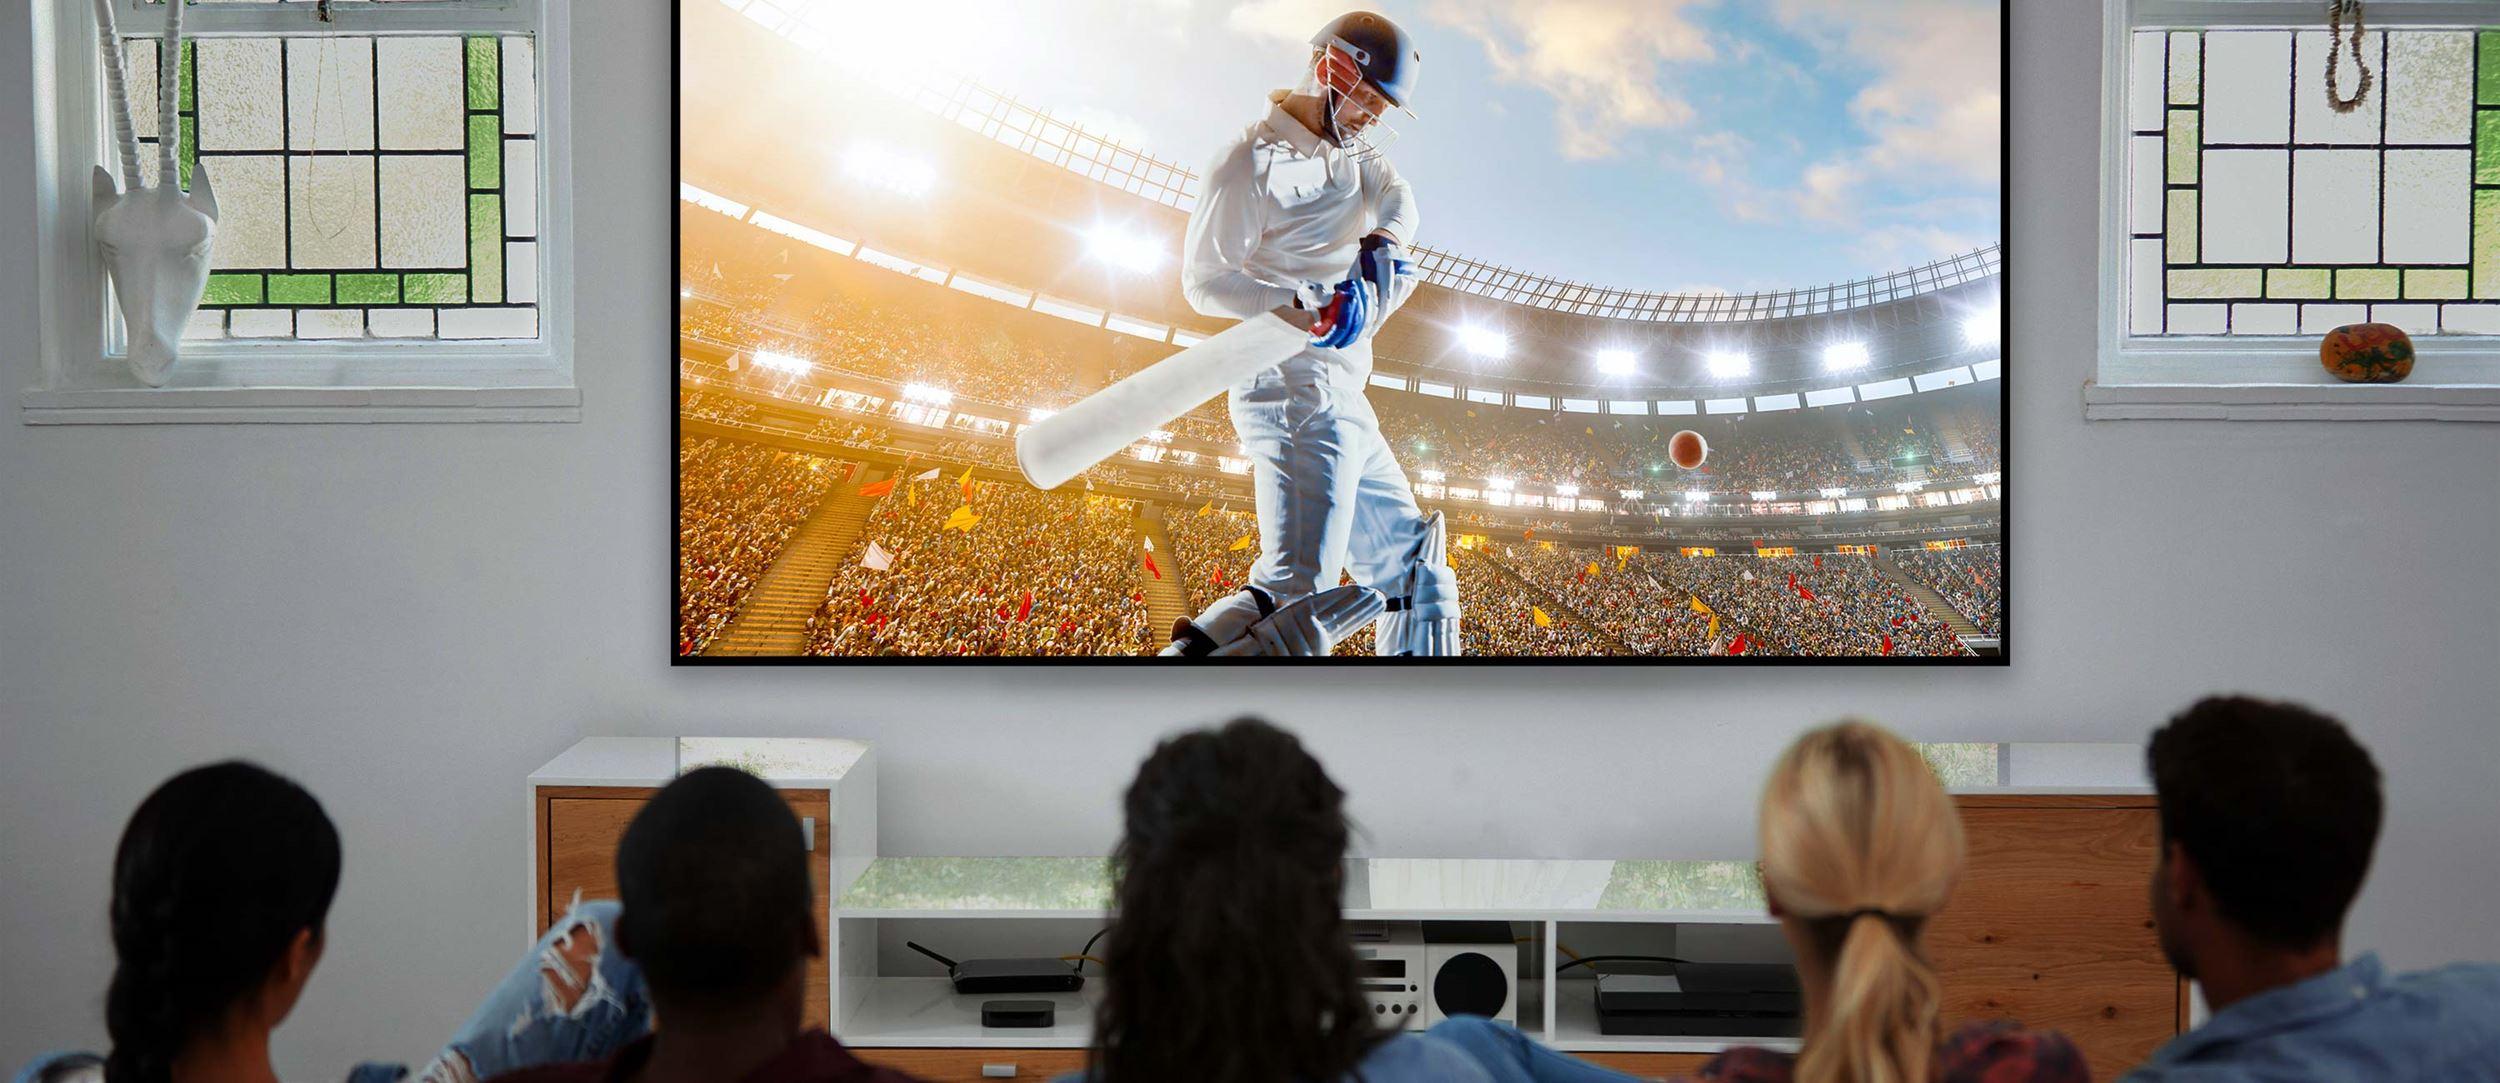 optoma hd35ust tv mode